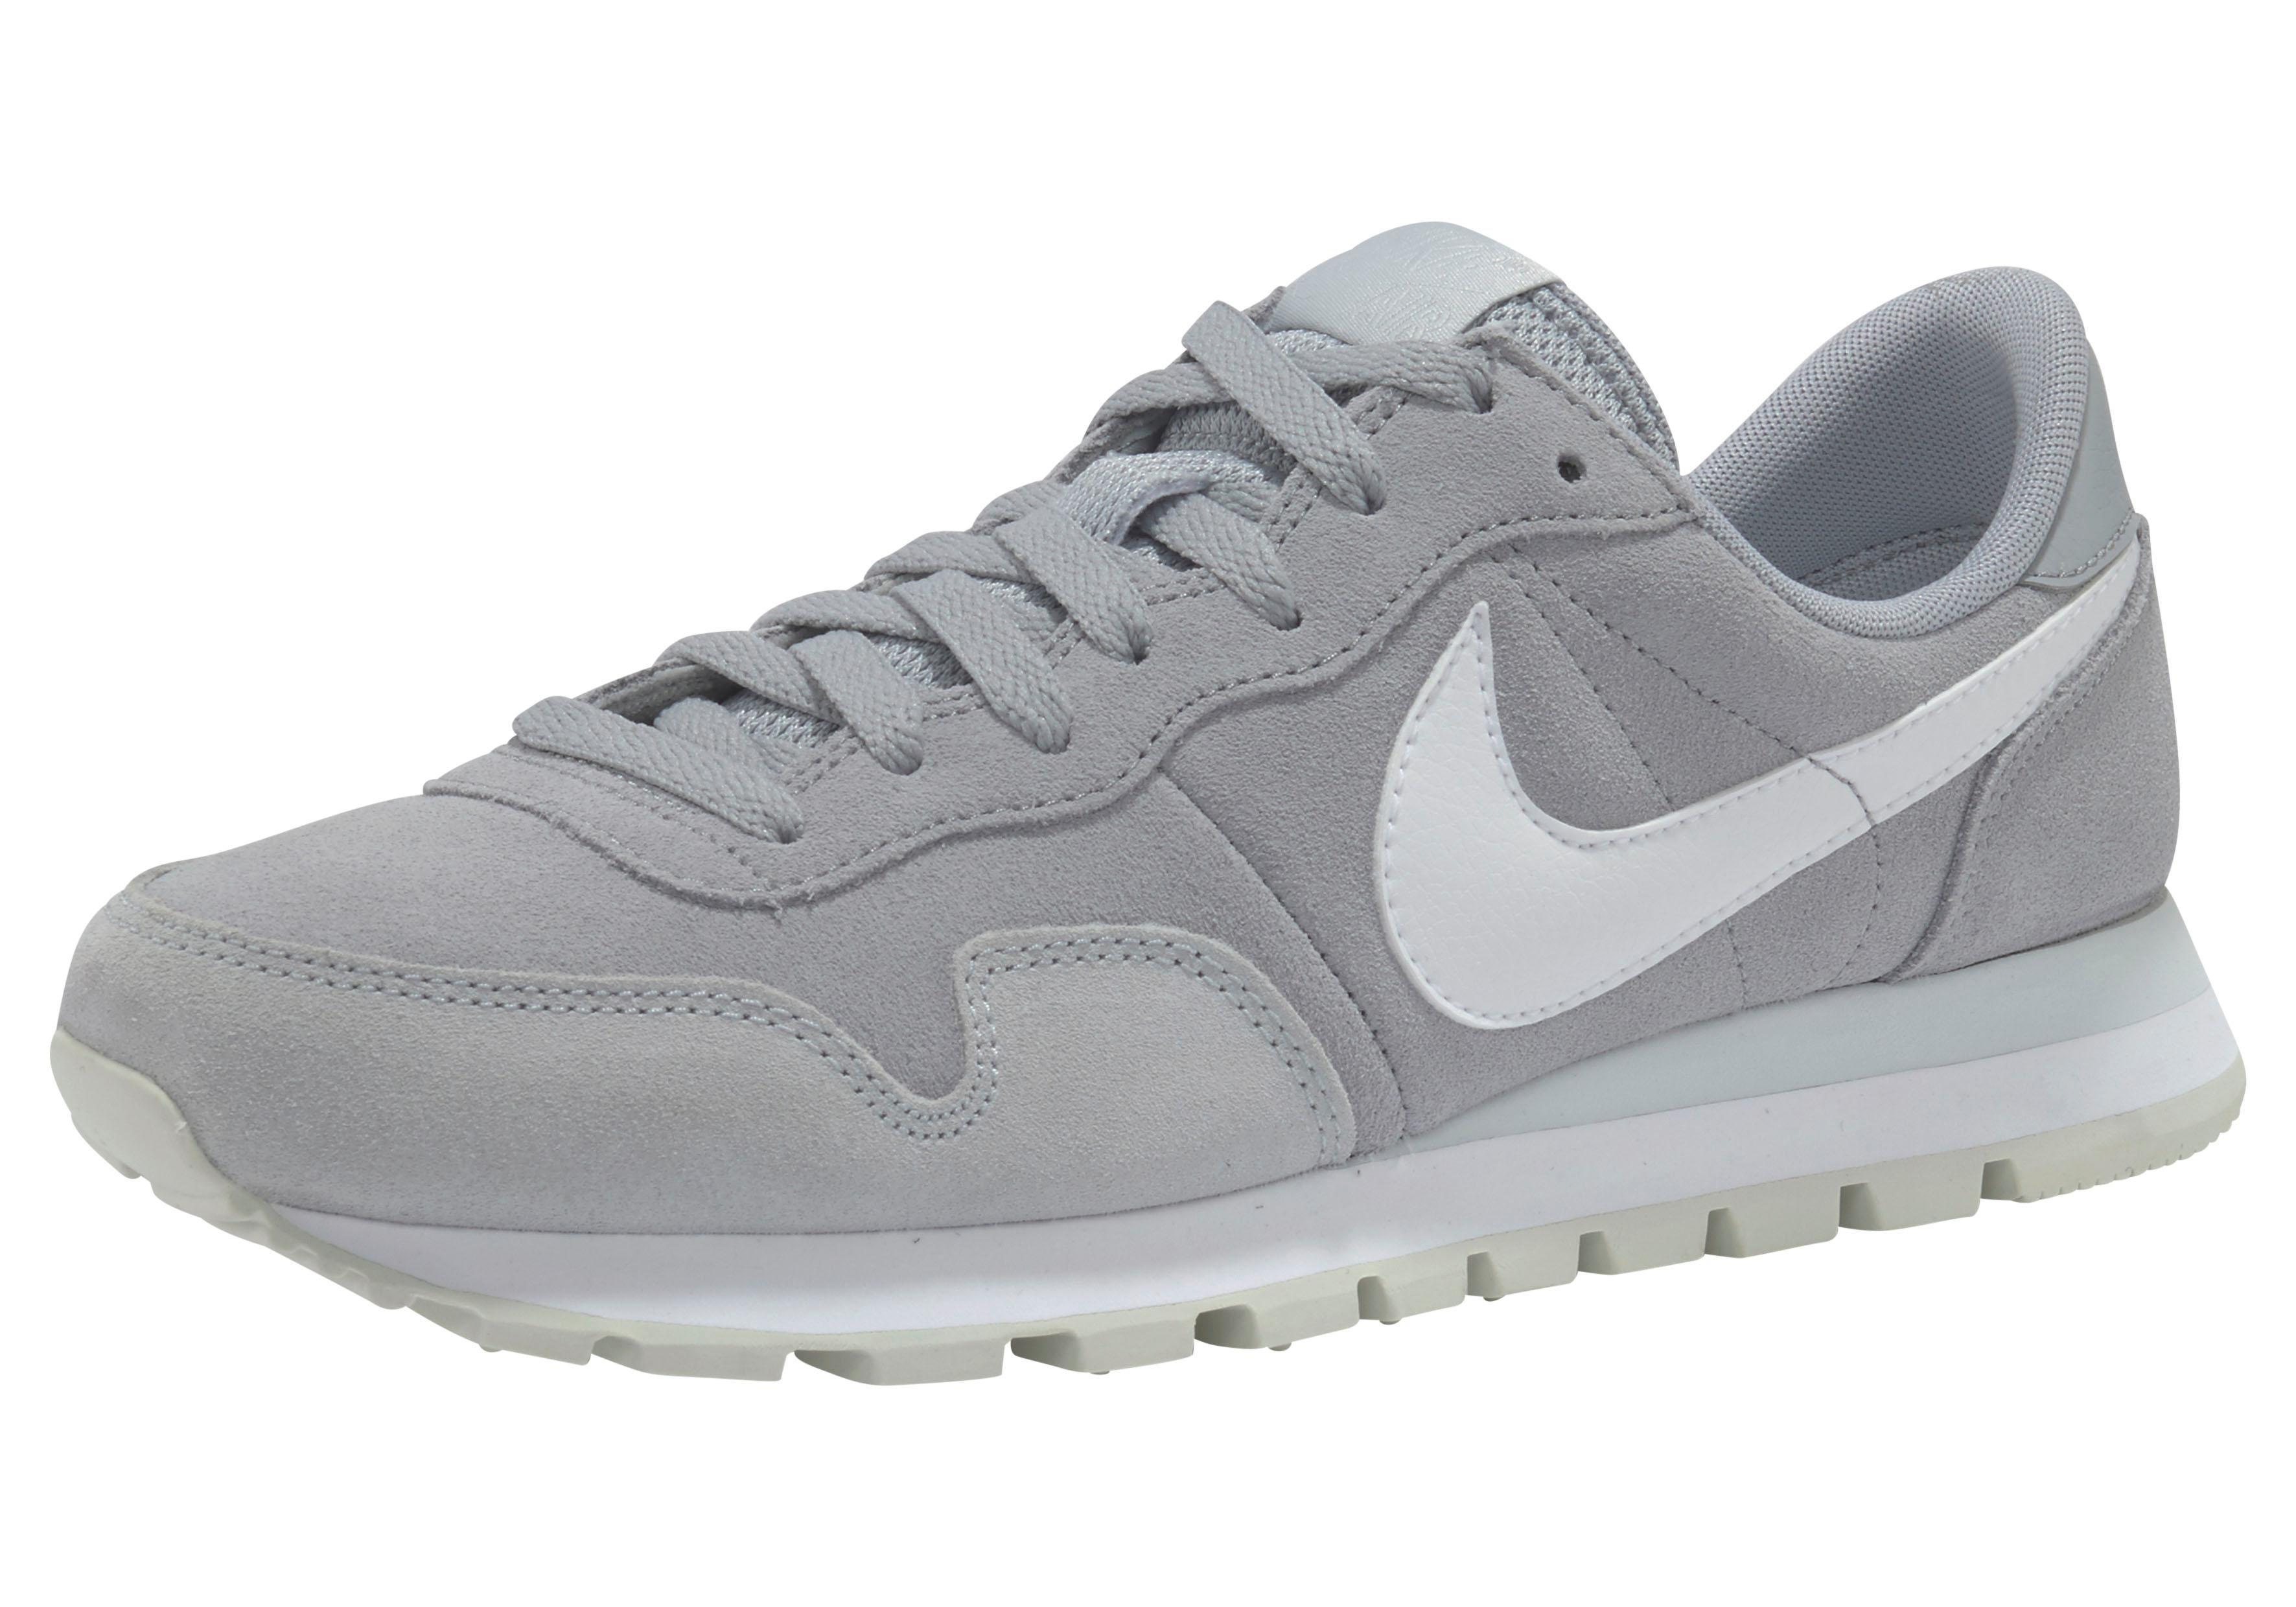 0a78e282ce2 ... Nike Sportswear sneakers »Wmns Air Pegasus '83«, Nike Sportswear  sneakers »Wmns Air Pegasus '83«, Nike Sportswear Air Pegasus 83 sneakers  dames